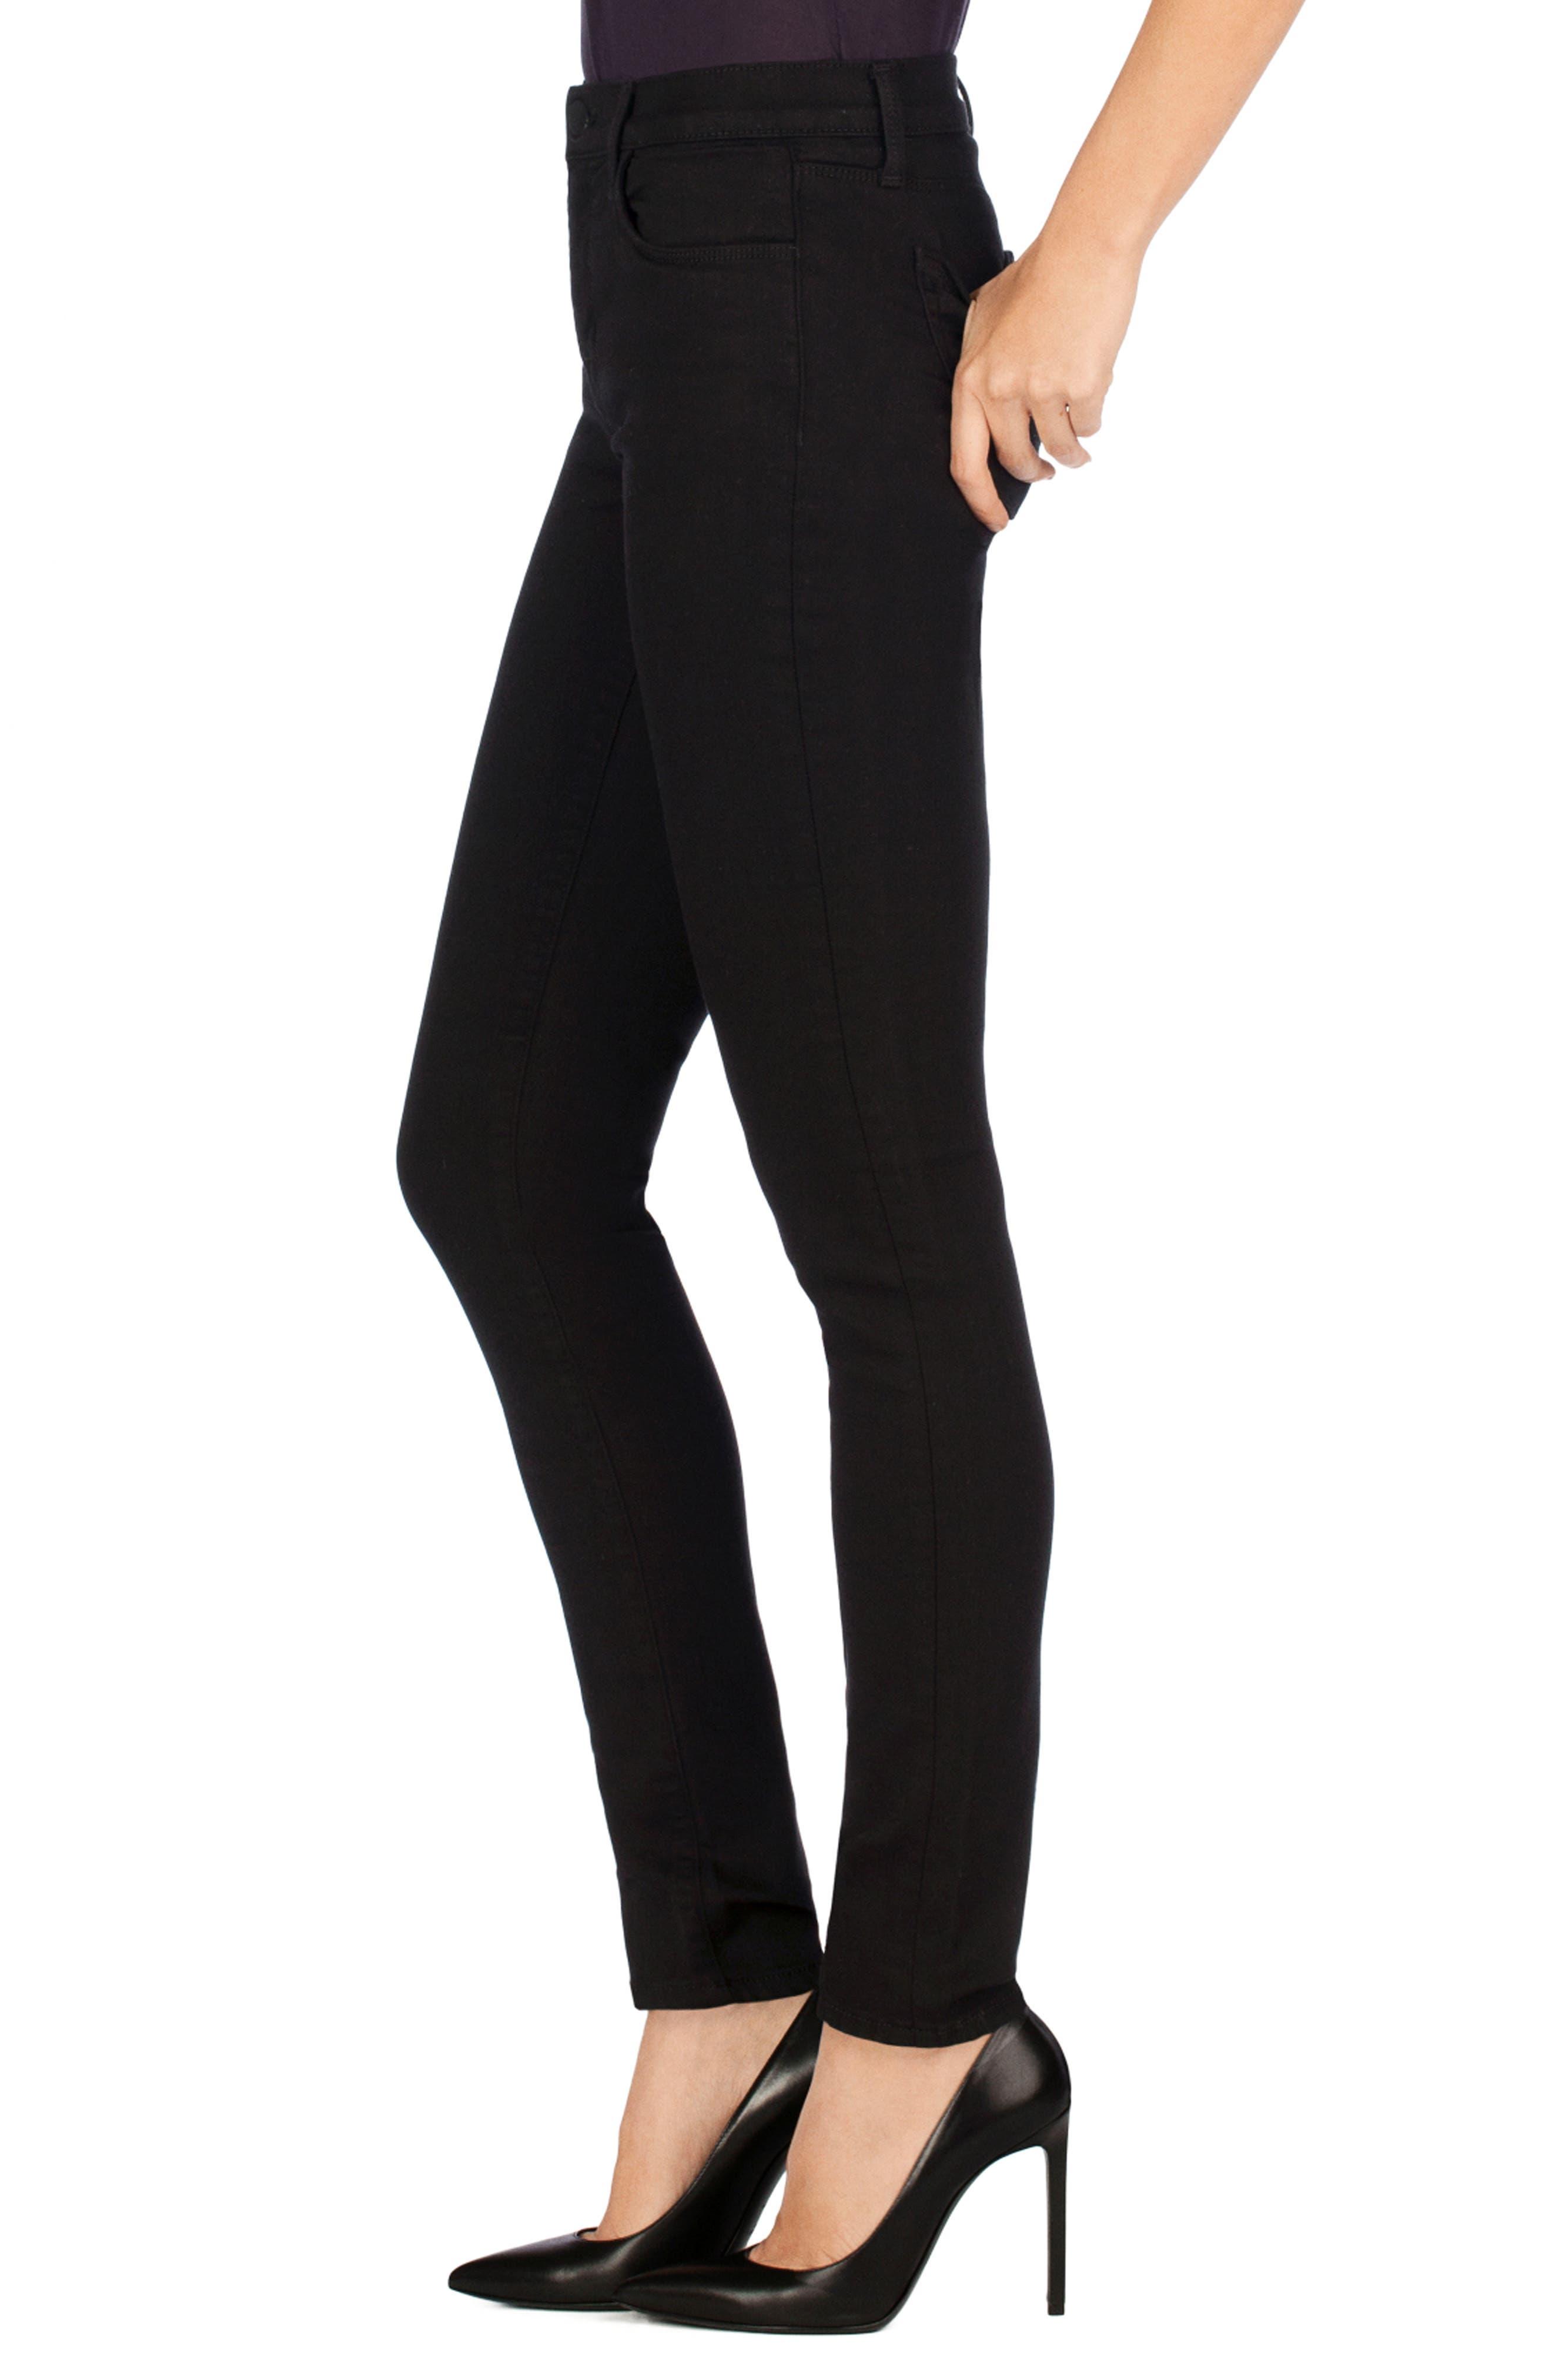 J BRAND,                             Super Skinny Jeans,                             Alternate thumbnail 3, color,                             SERIOUSLY BLACK